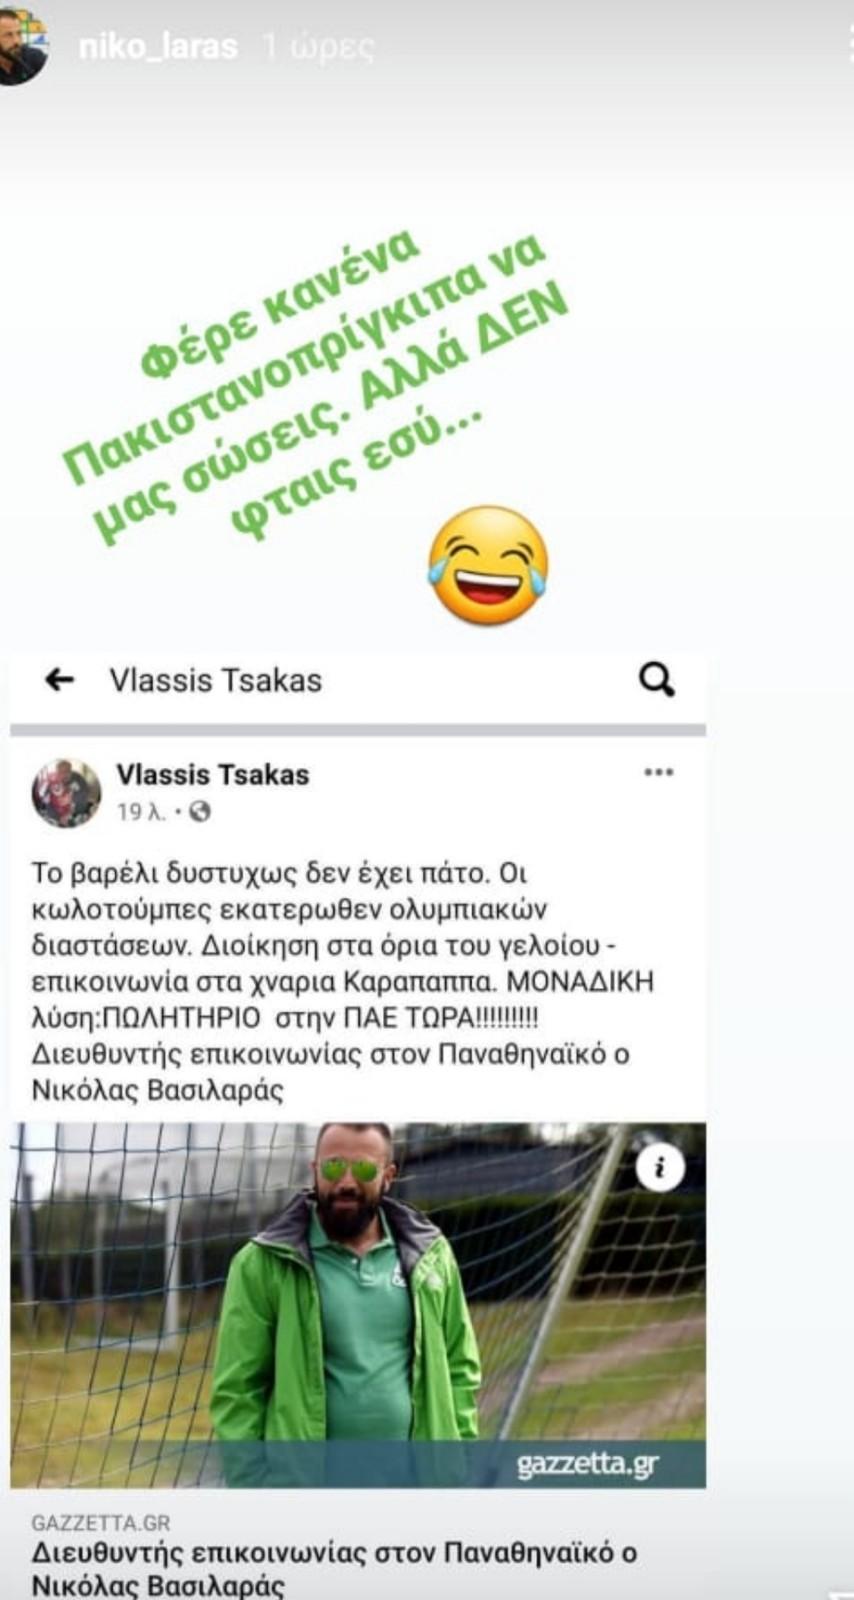 Tsakas Vasilaras